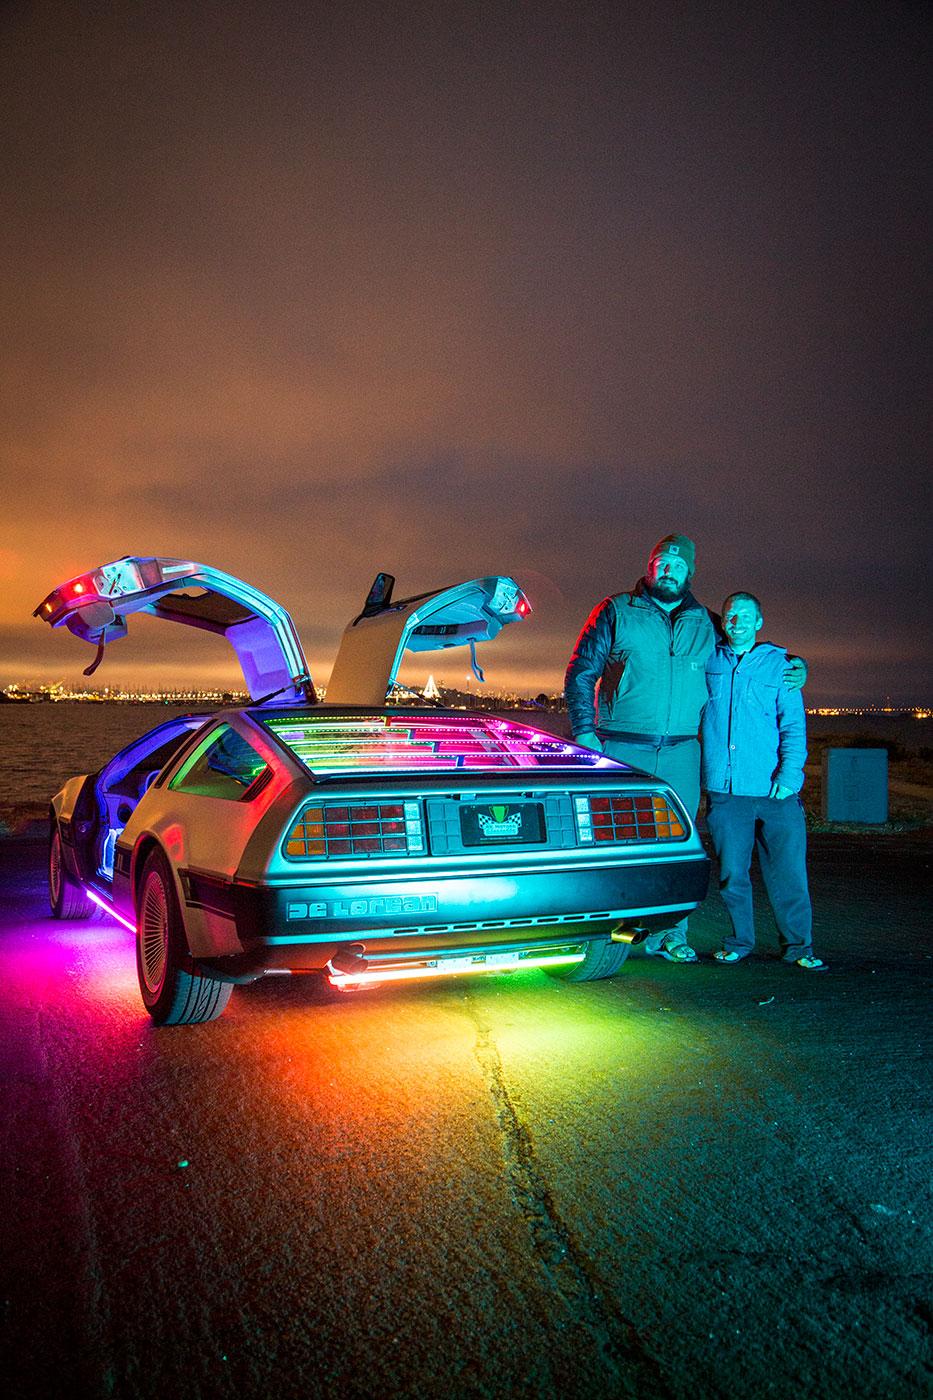 Gumball 3000 & The DMC DeLorean